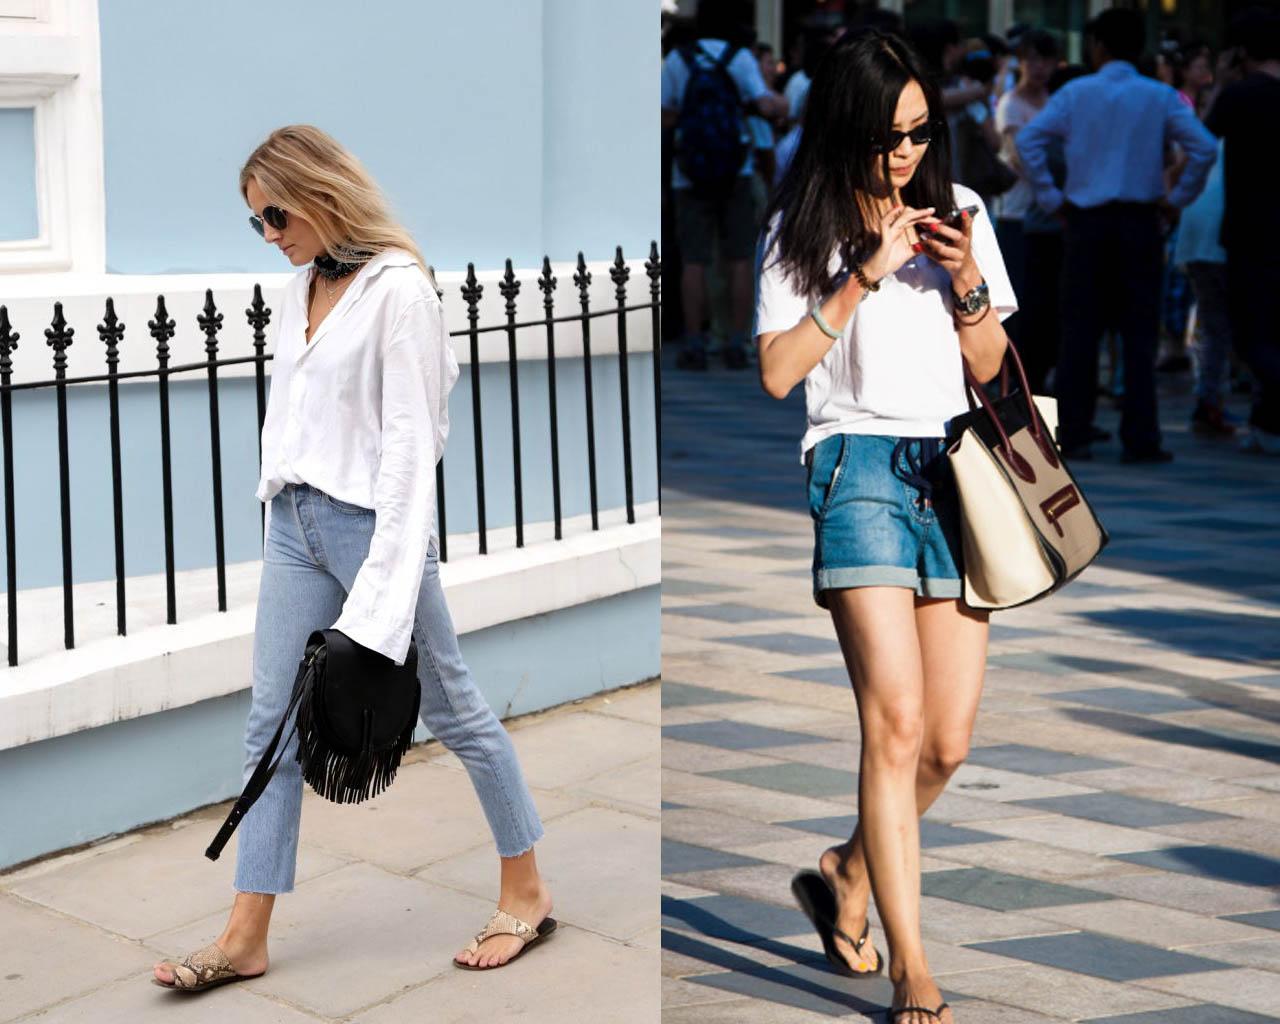 sincerely jones flip flops havaianas summer white chic trendy summer 2016 rua de baixo ana amaro portugal